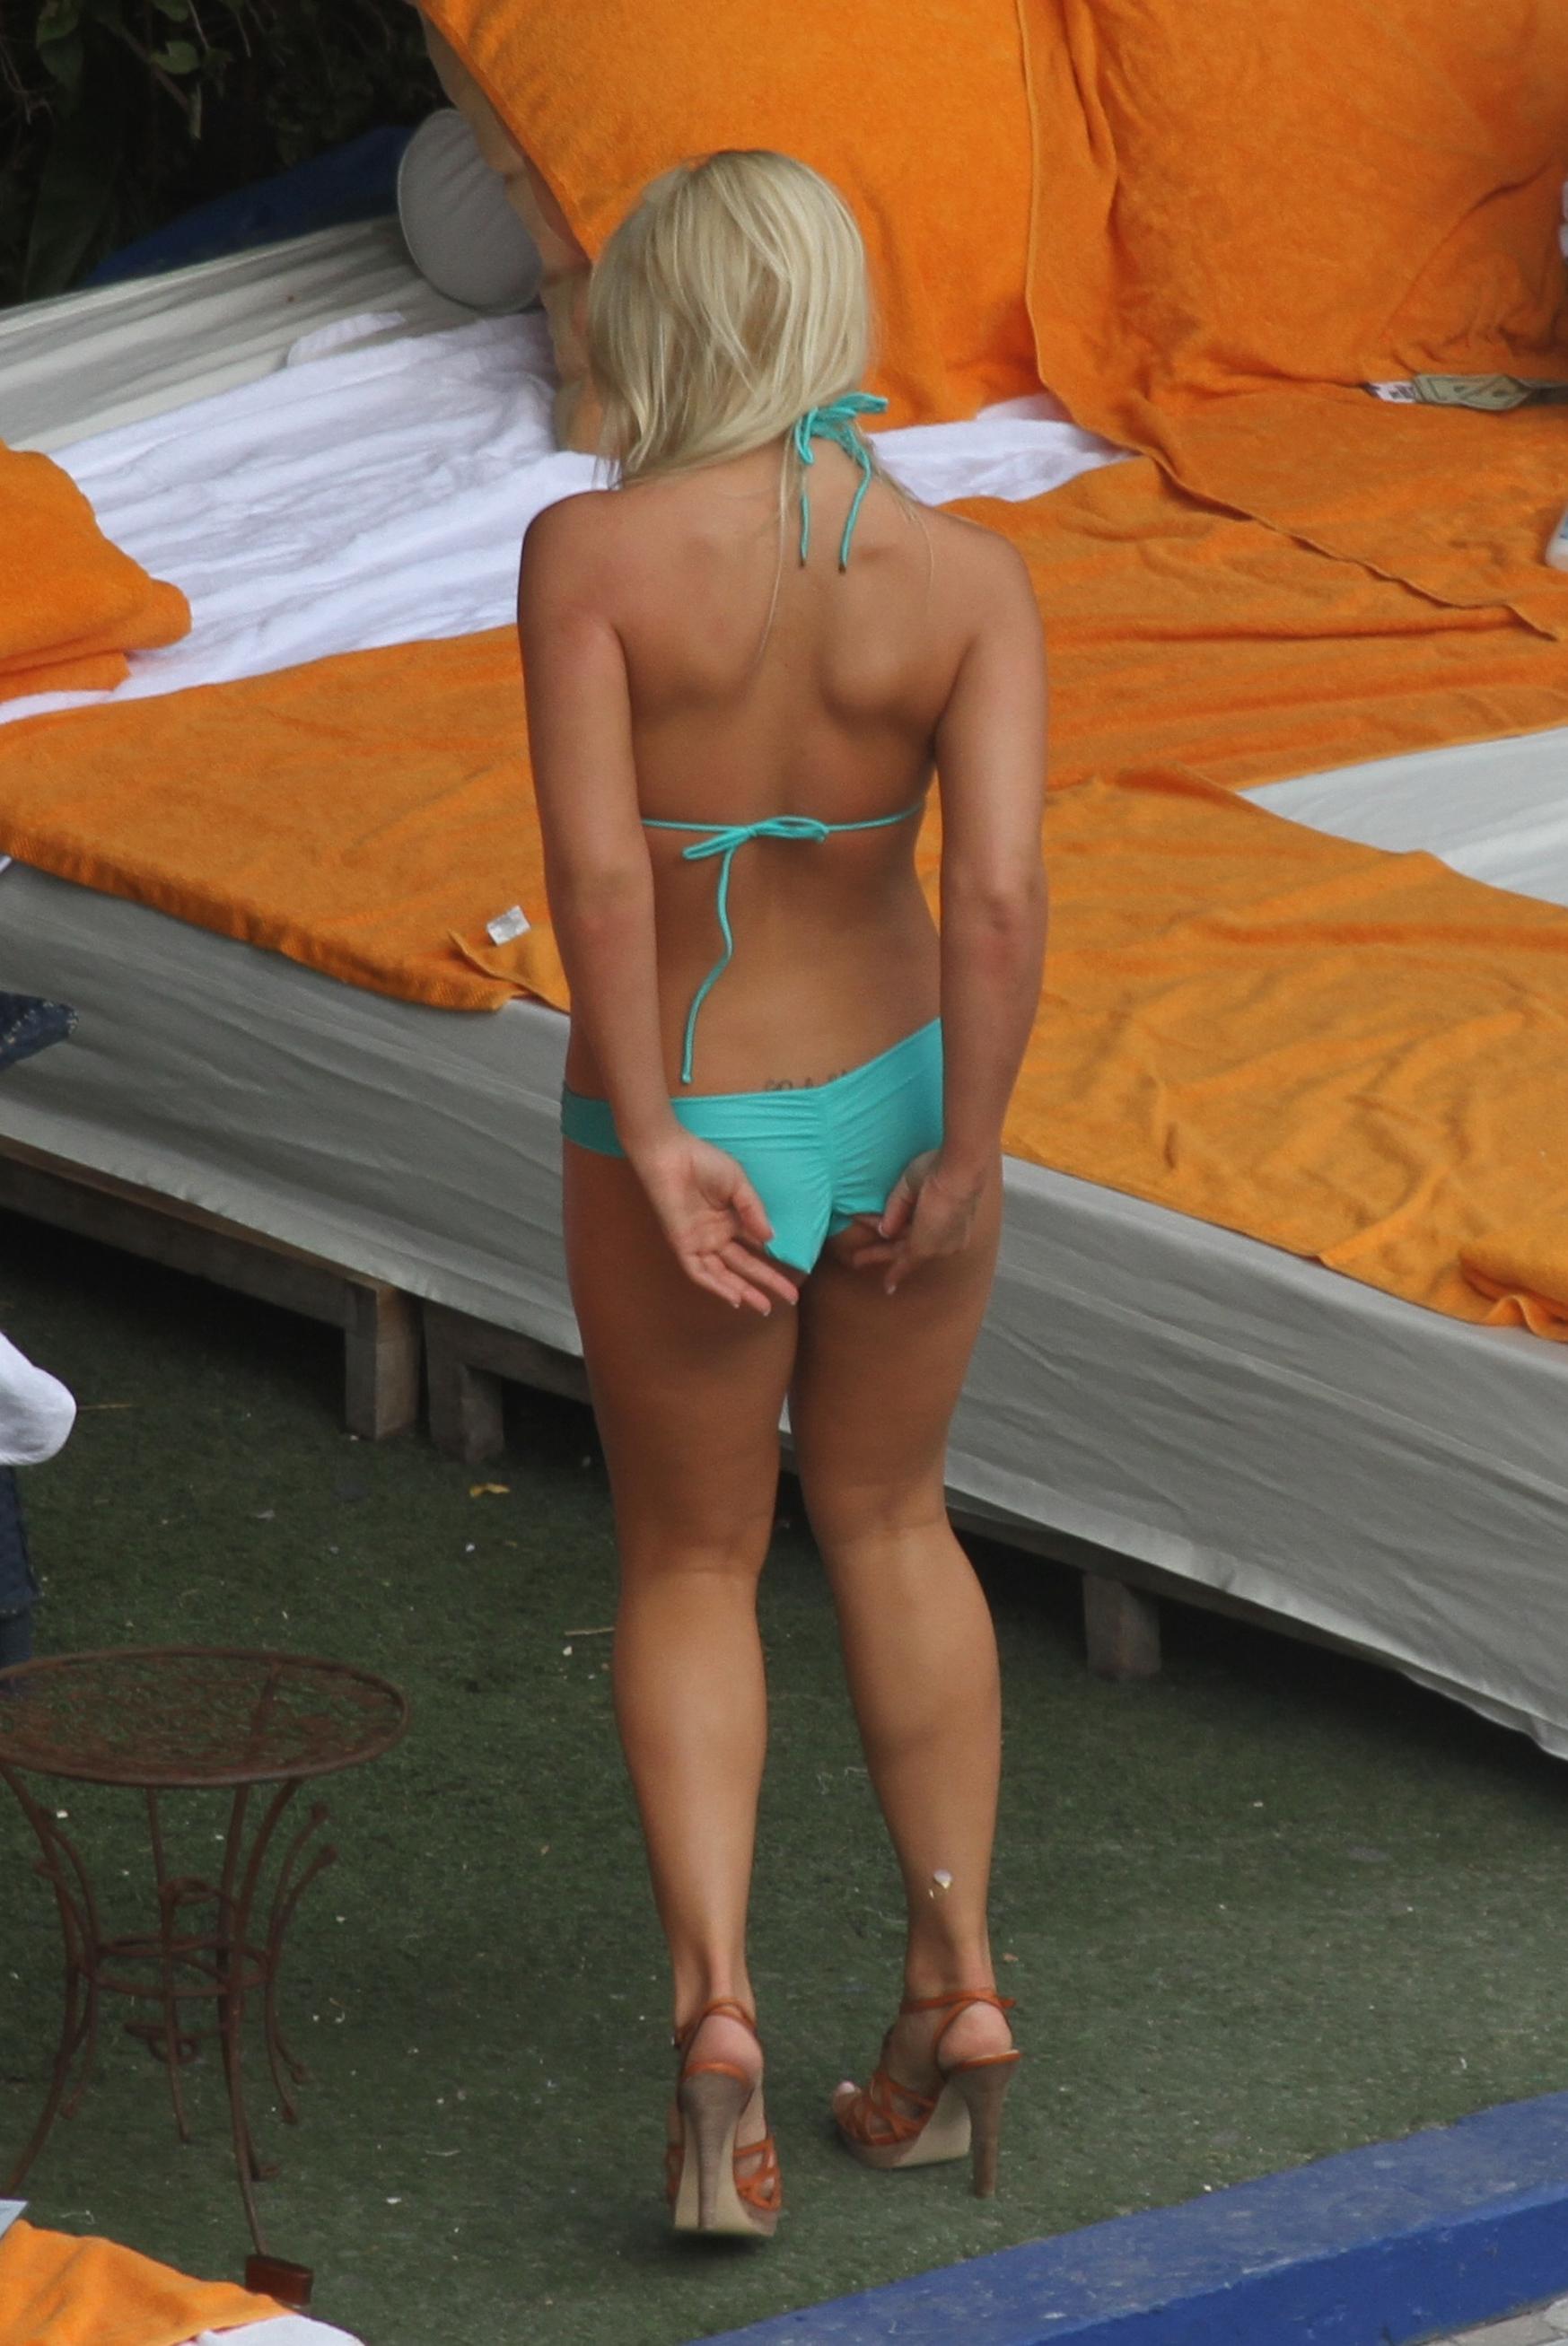 brazzers asses in public